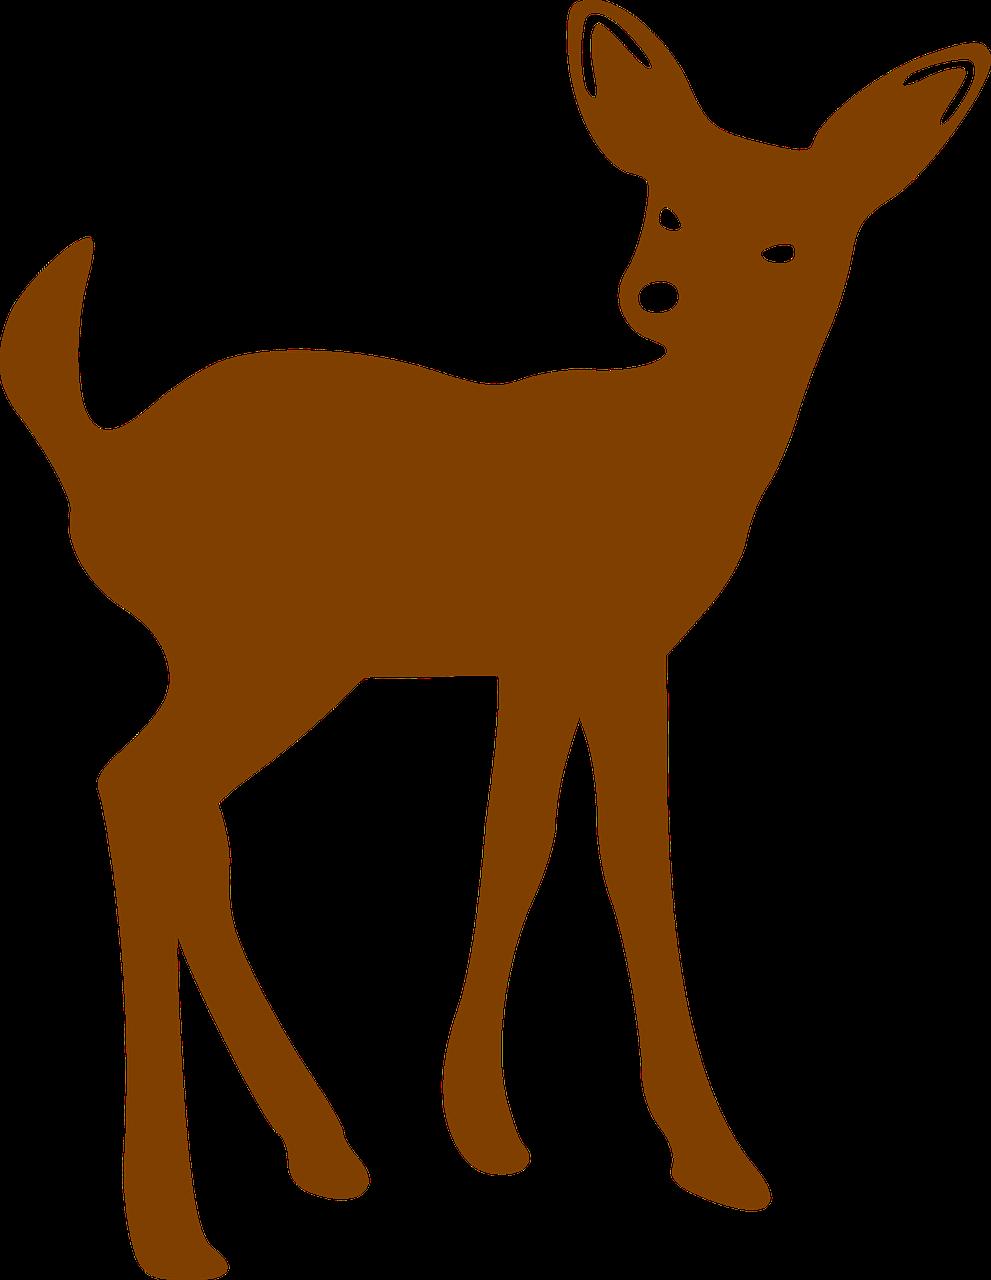 Deer Bambi Brown Mammal Transparent Image Pinterest.